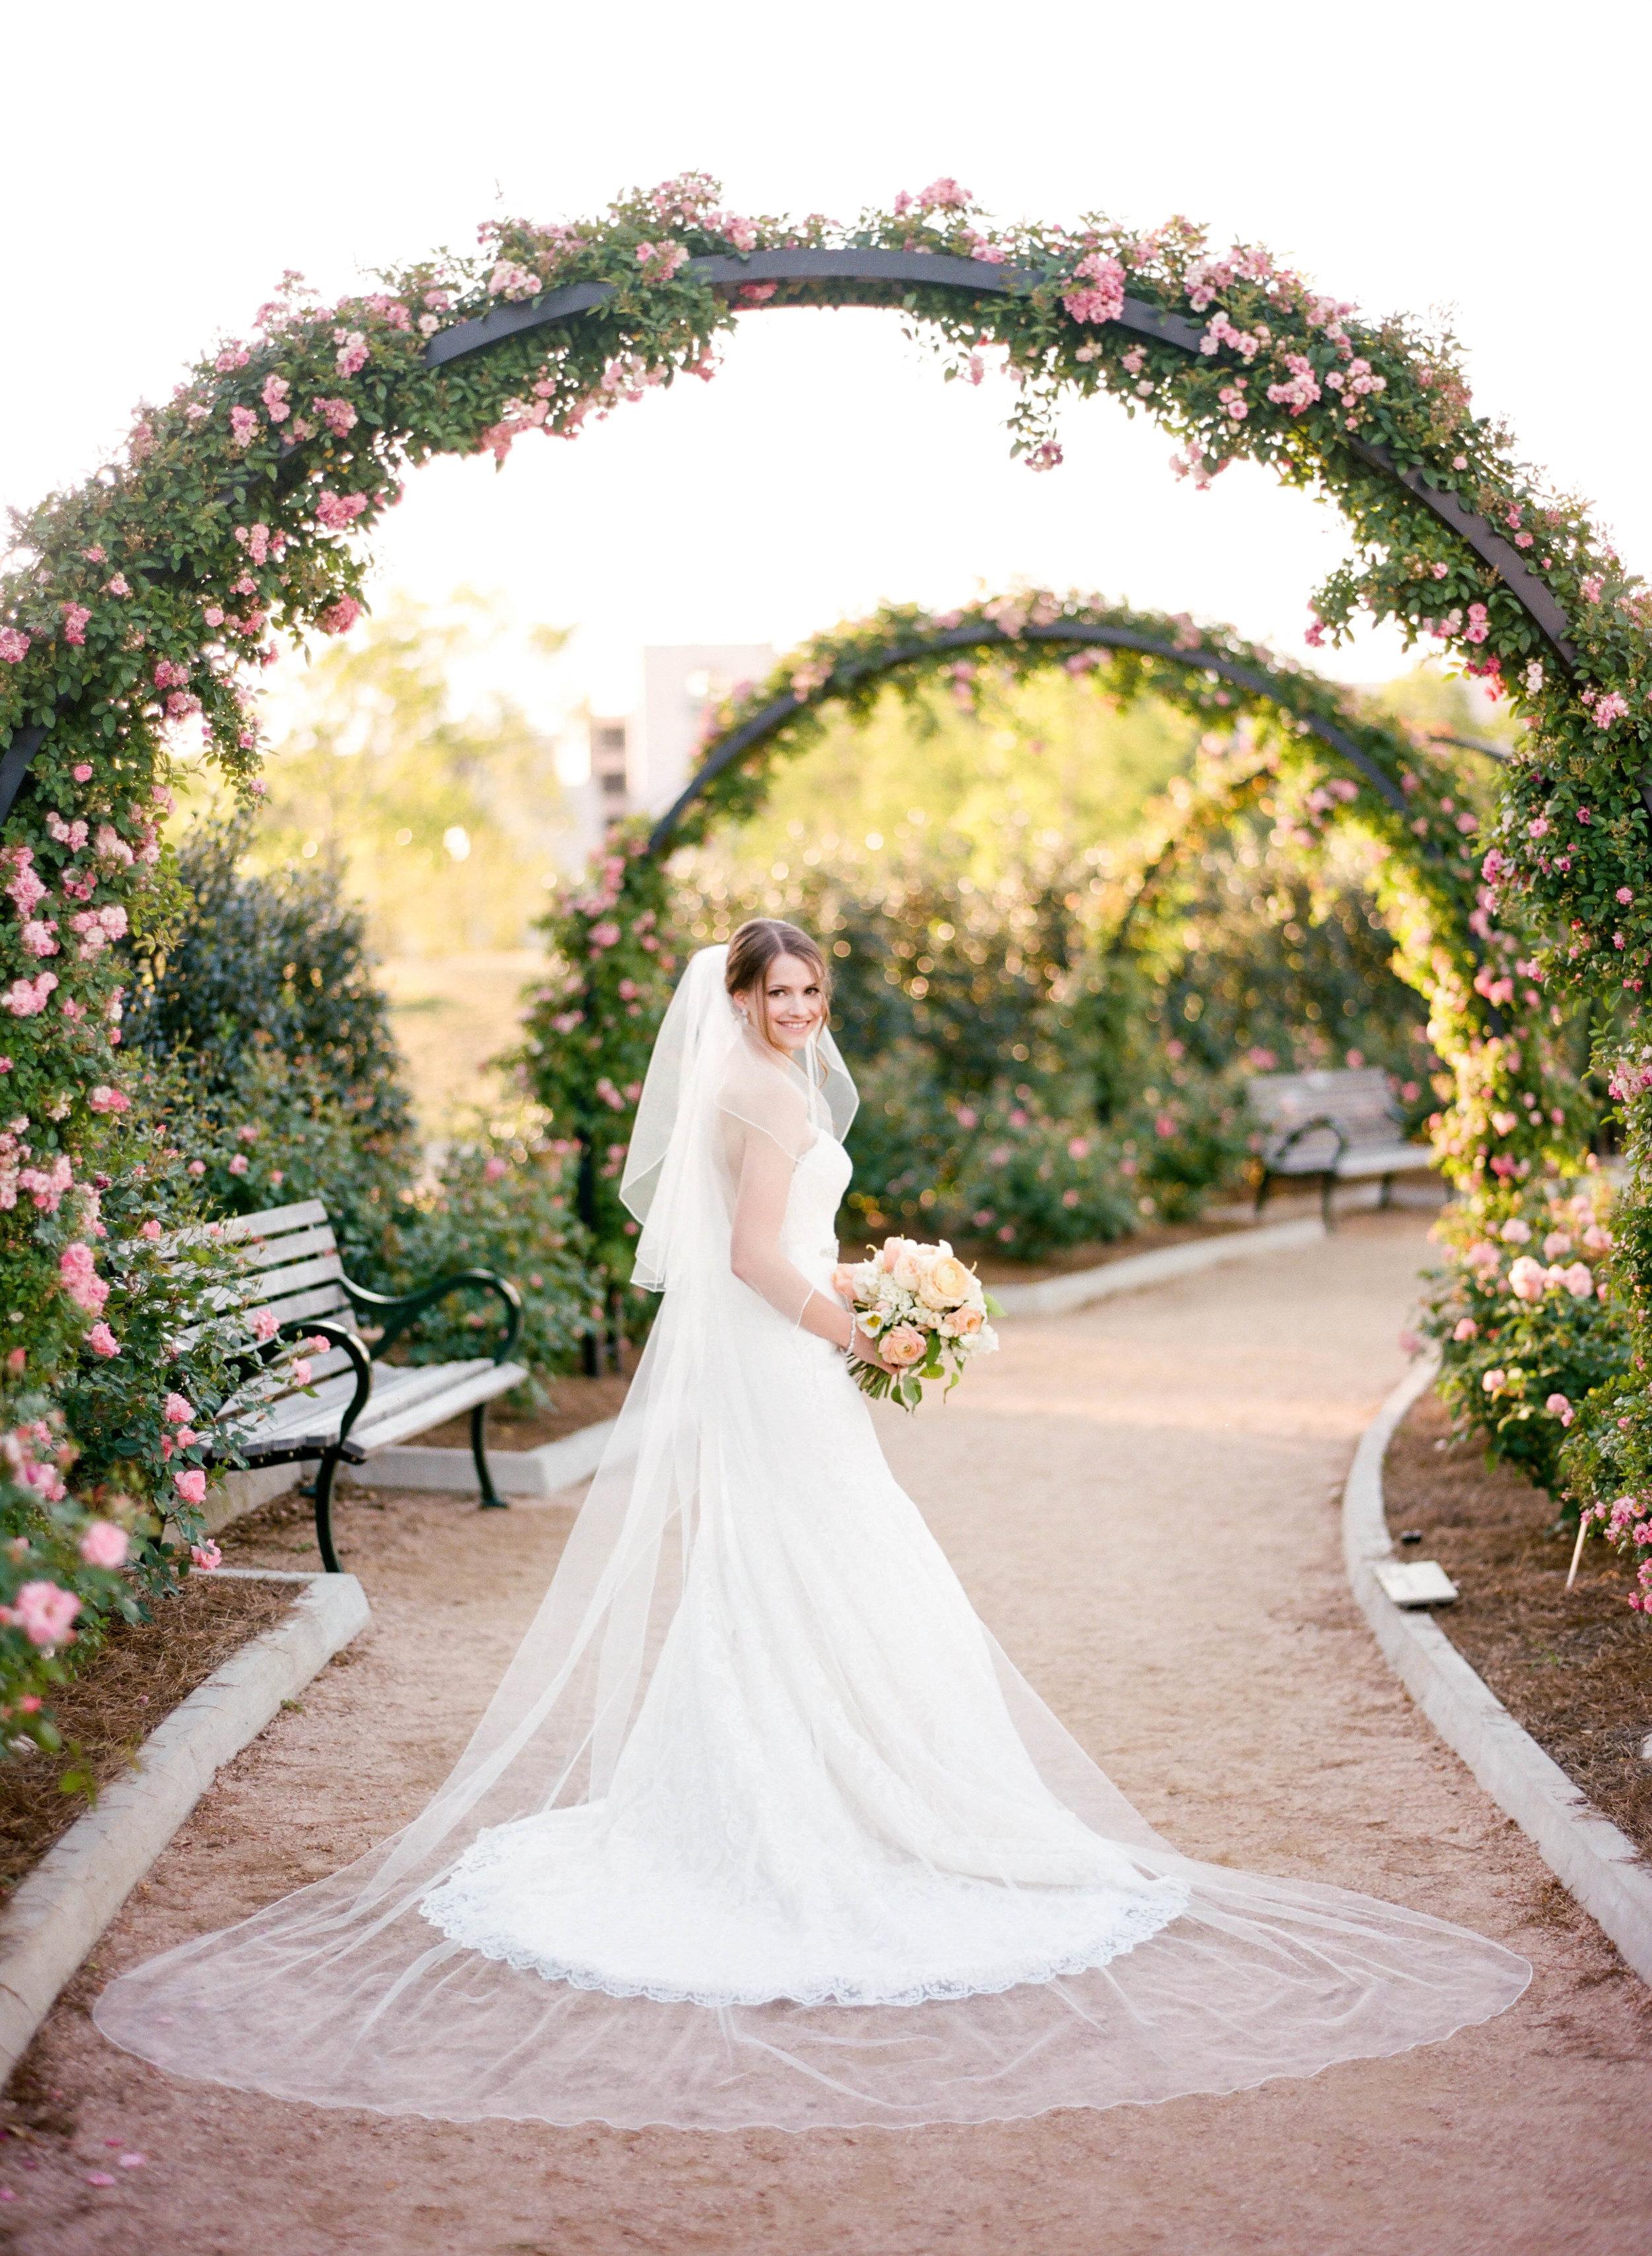 Houston-Wedding-Photographer-Film-Fine-Art-Bridals-Dana Fernandez-Photography-1.jpg